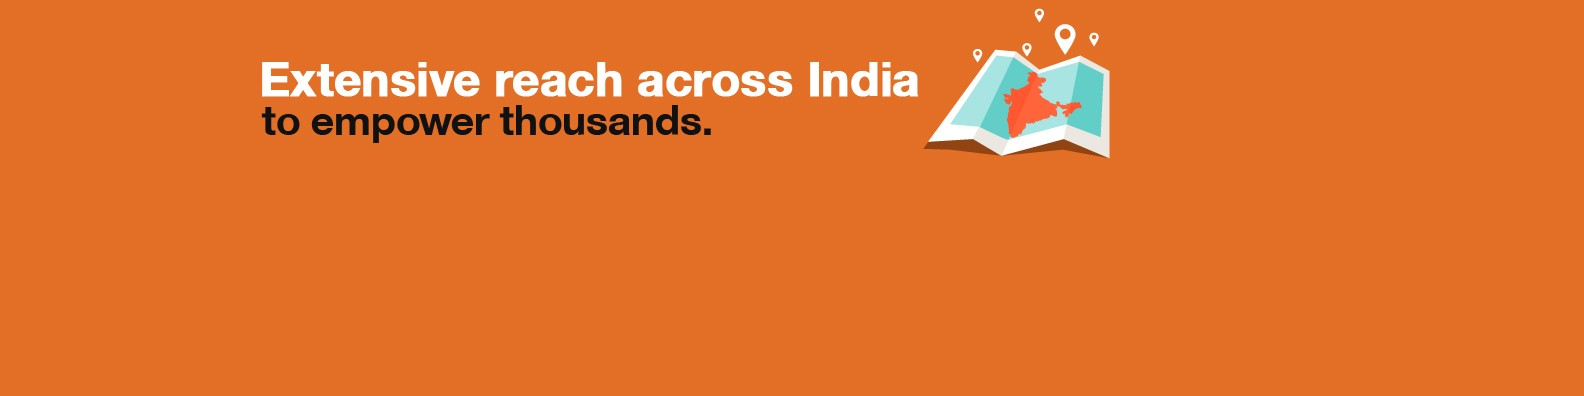 33859a91b82 Fullerton India Credit Company Ltd. cover image